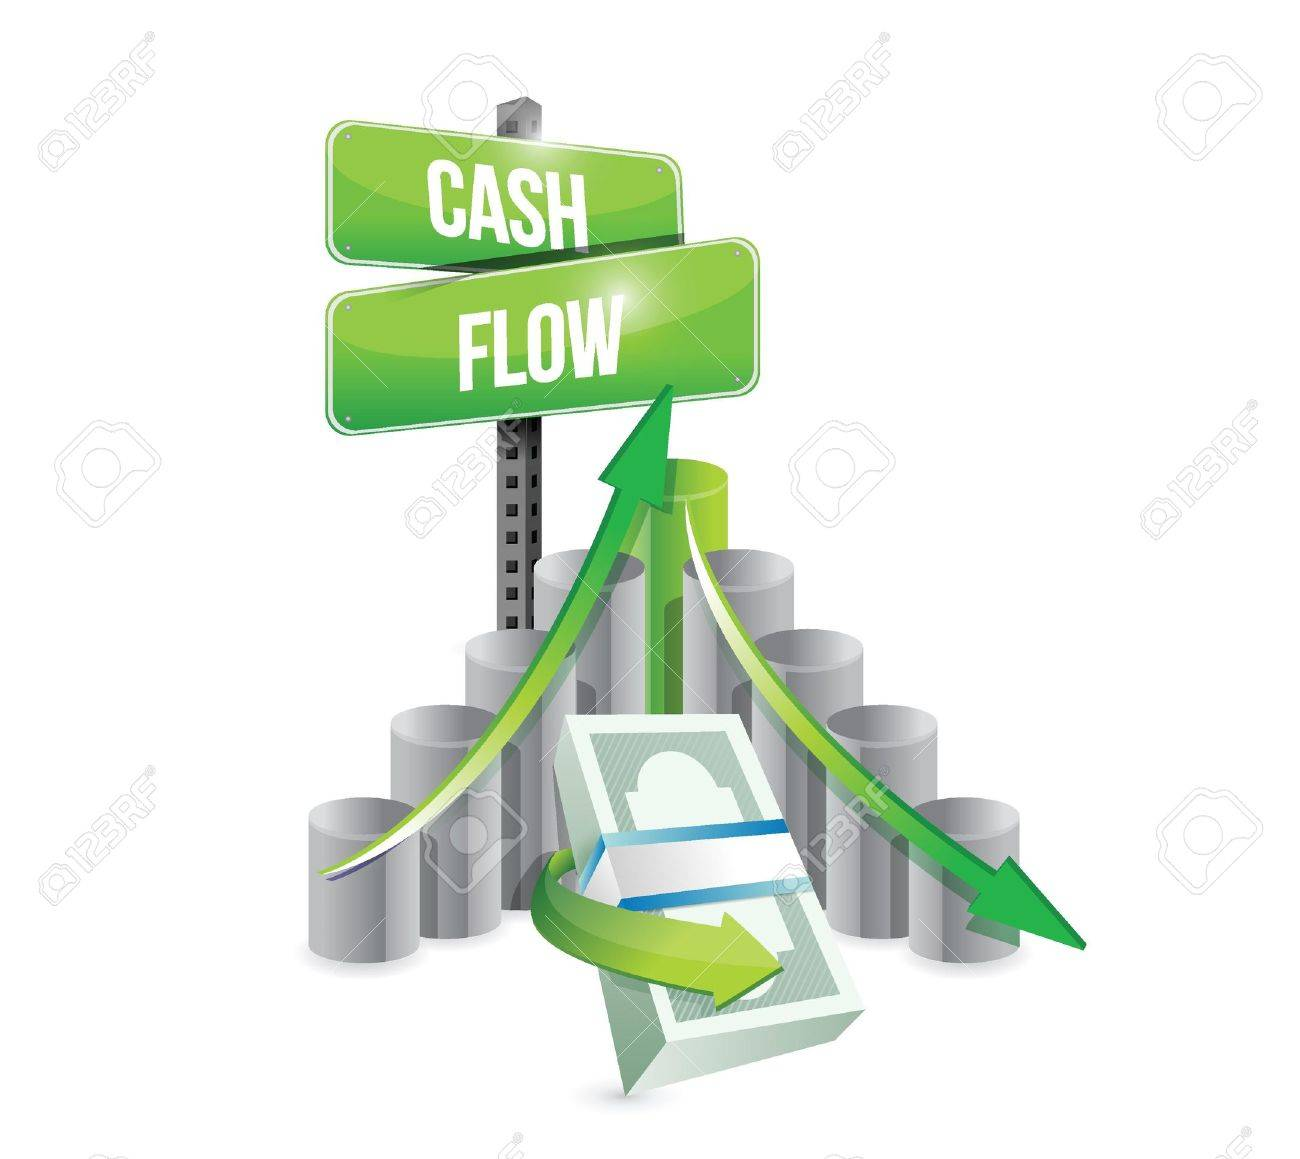 cash flow business graph illustration design over a white background.